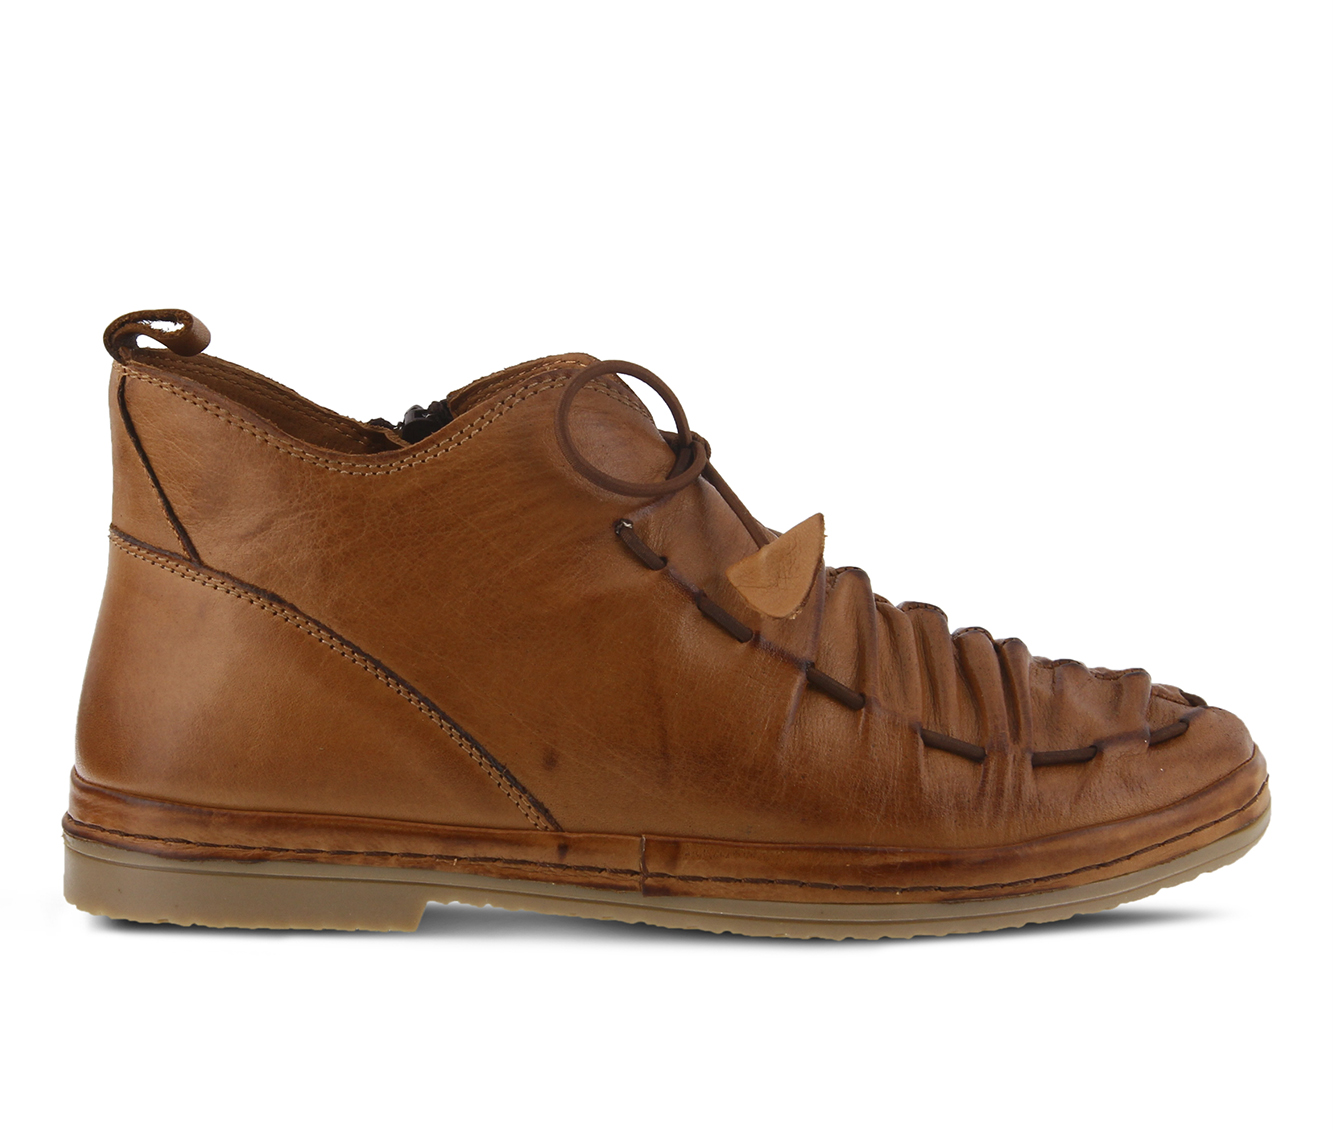 SPRING STEP Nestren Women's Shoe (Brown - Leather)